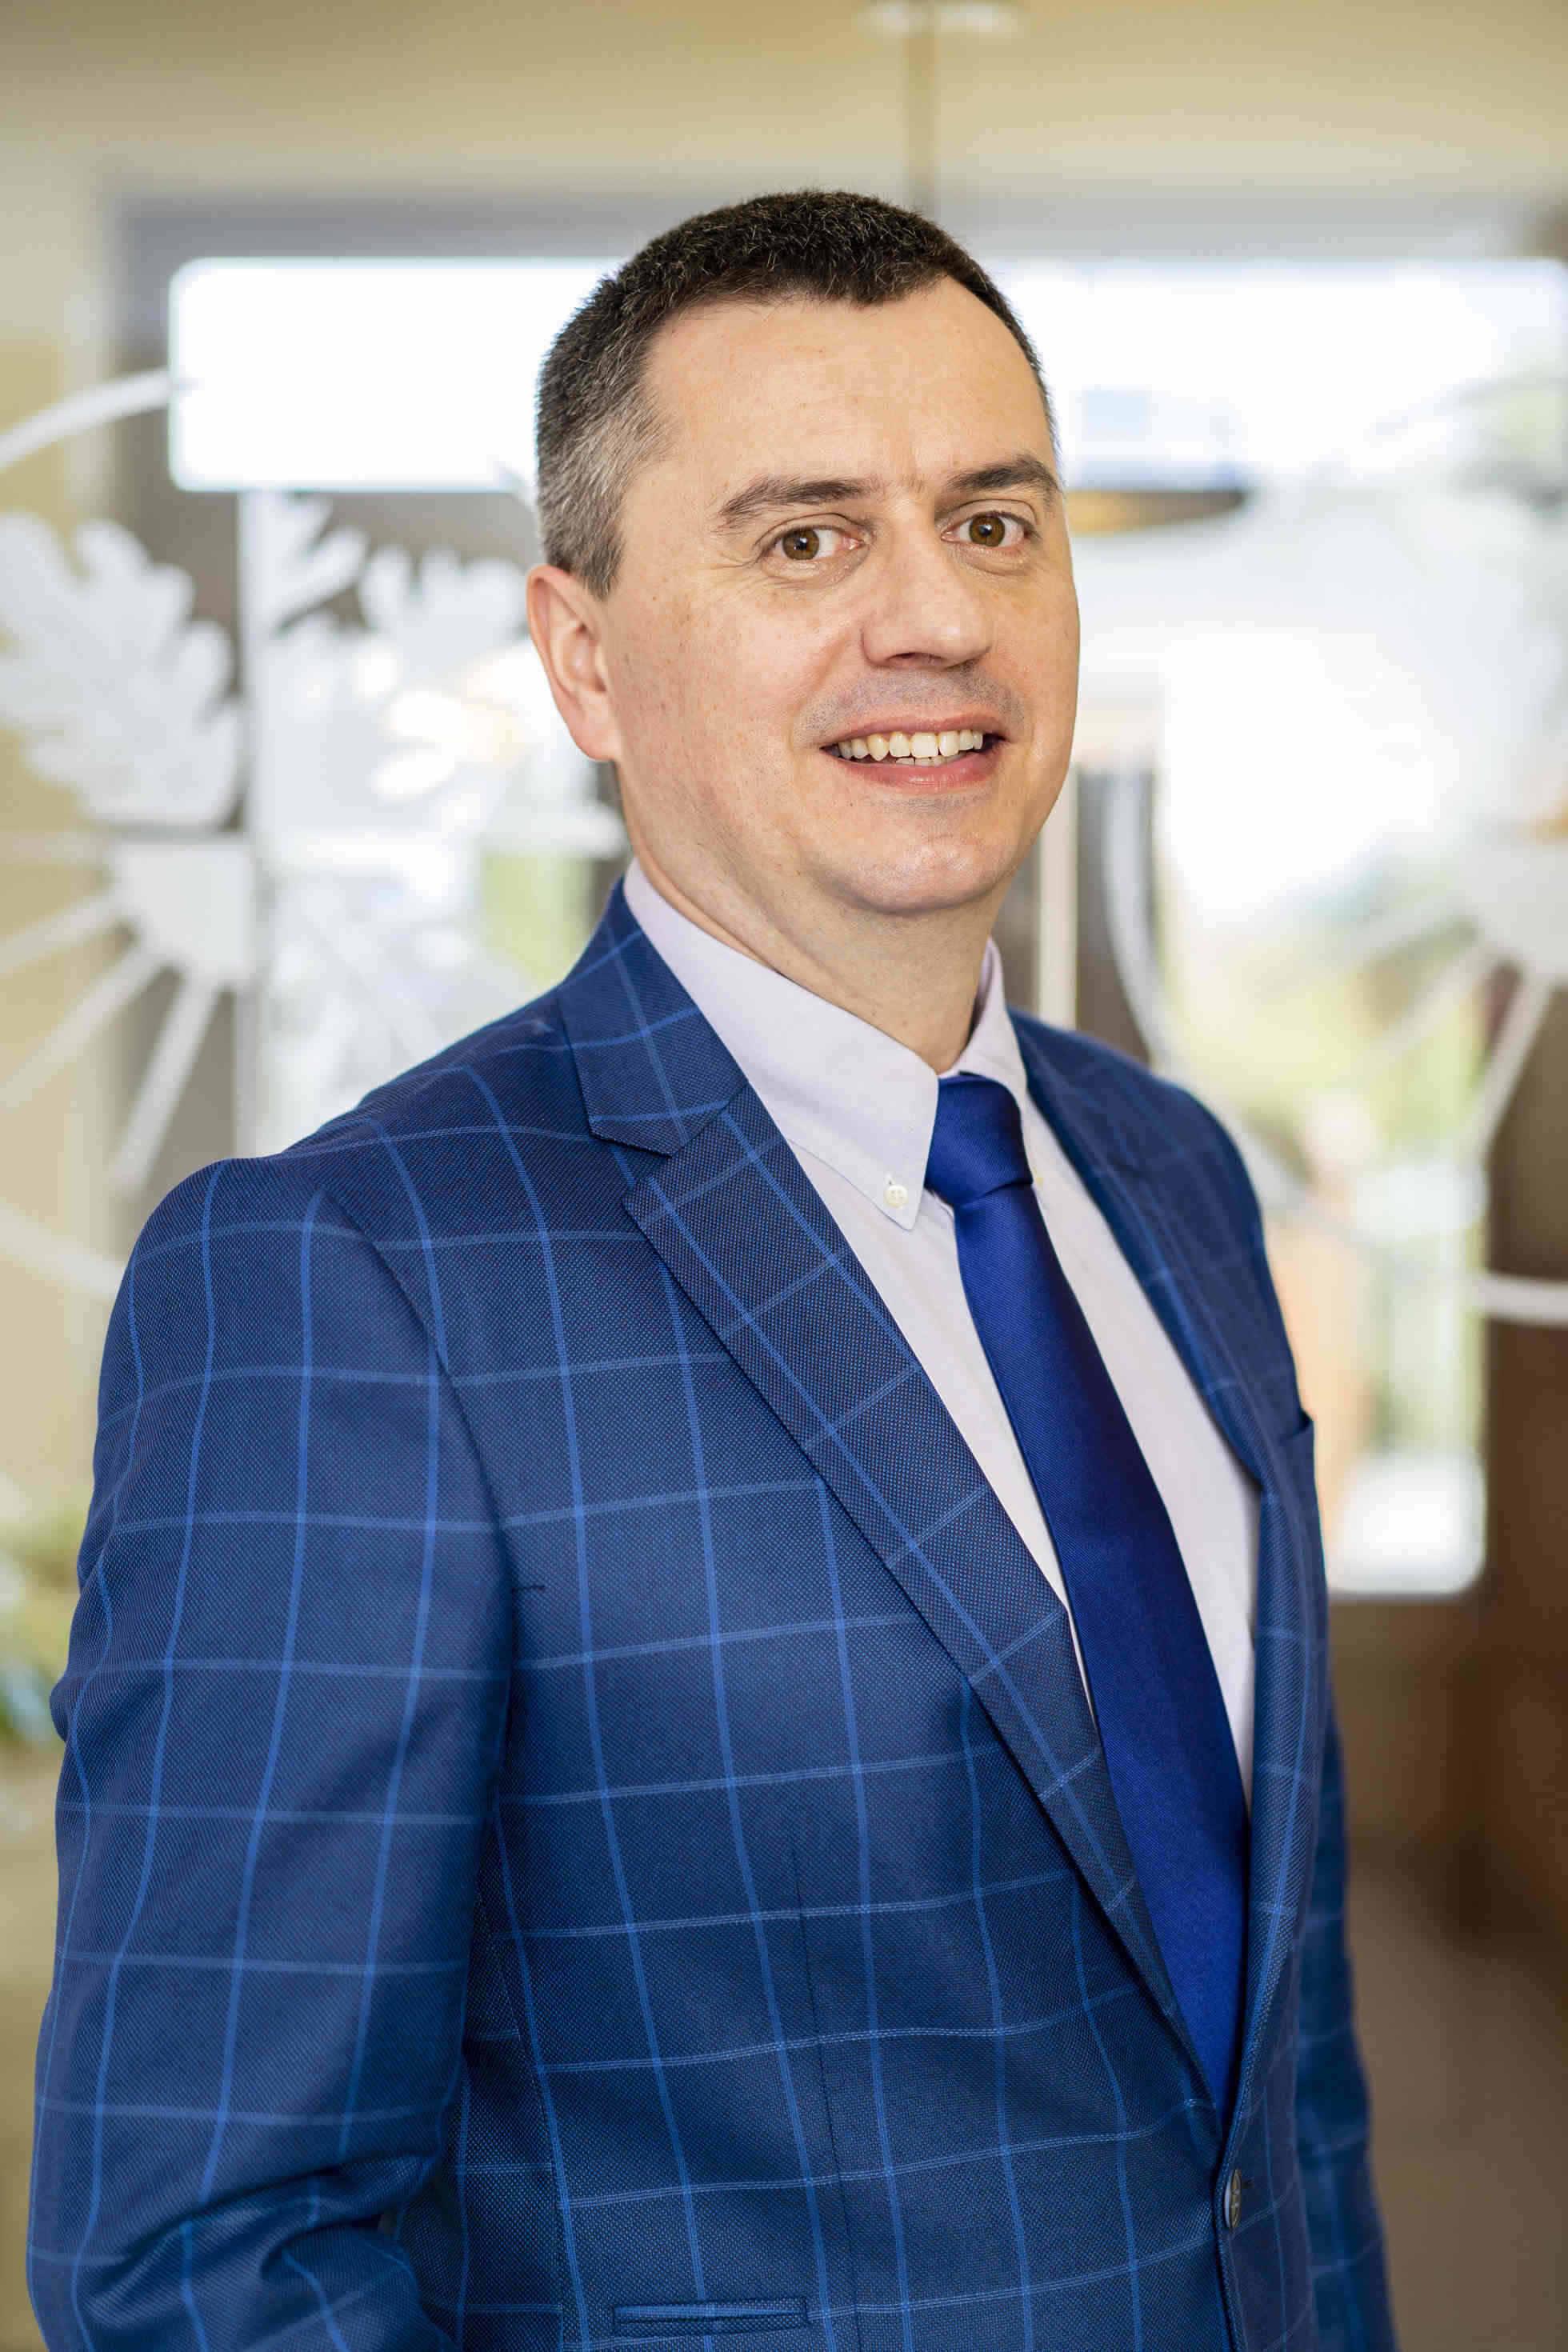 Doktor Szymon Krysta